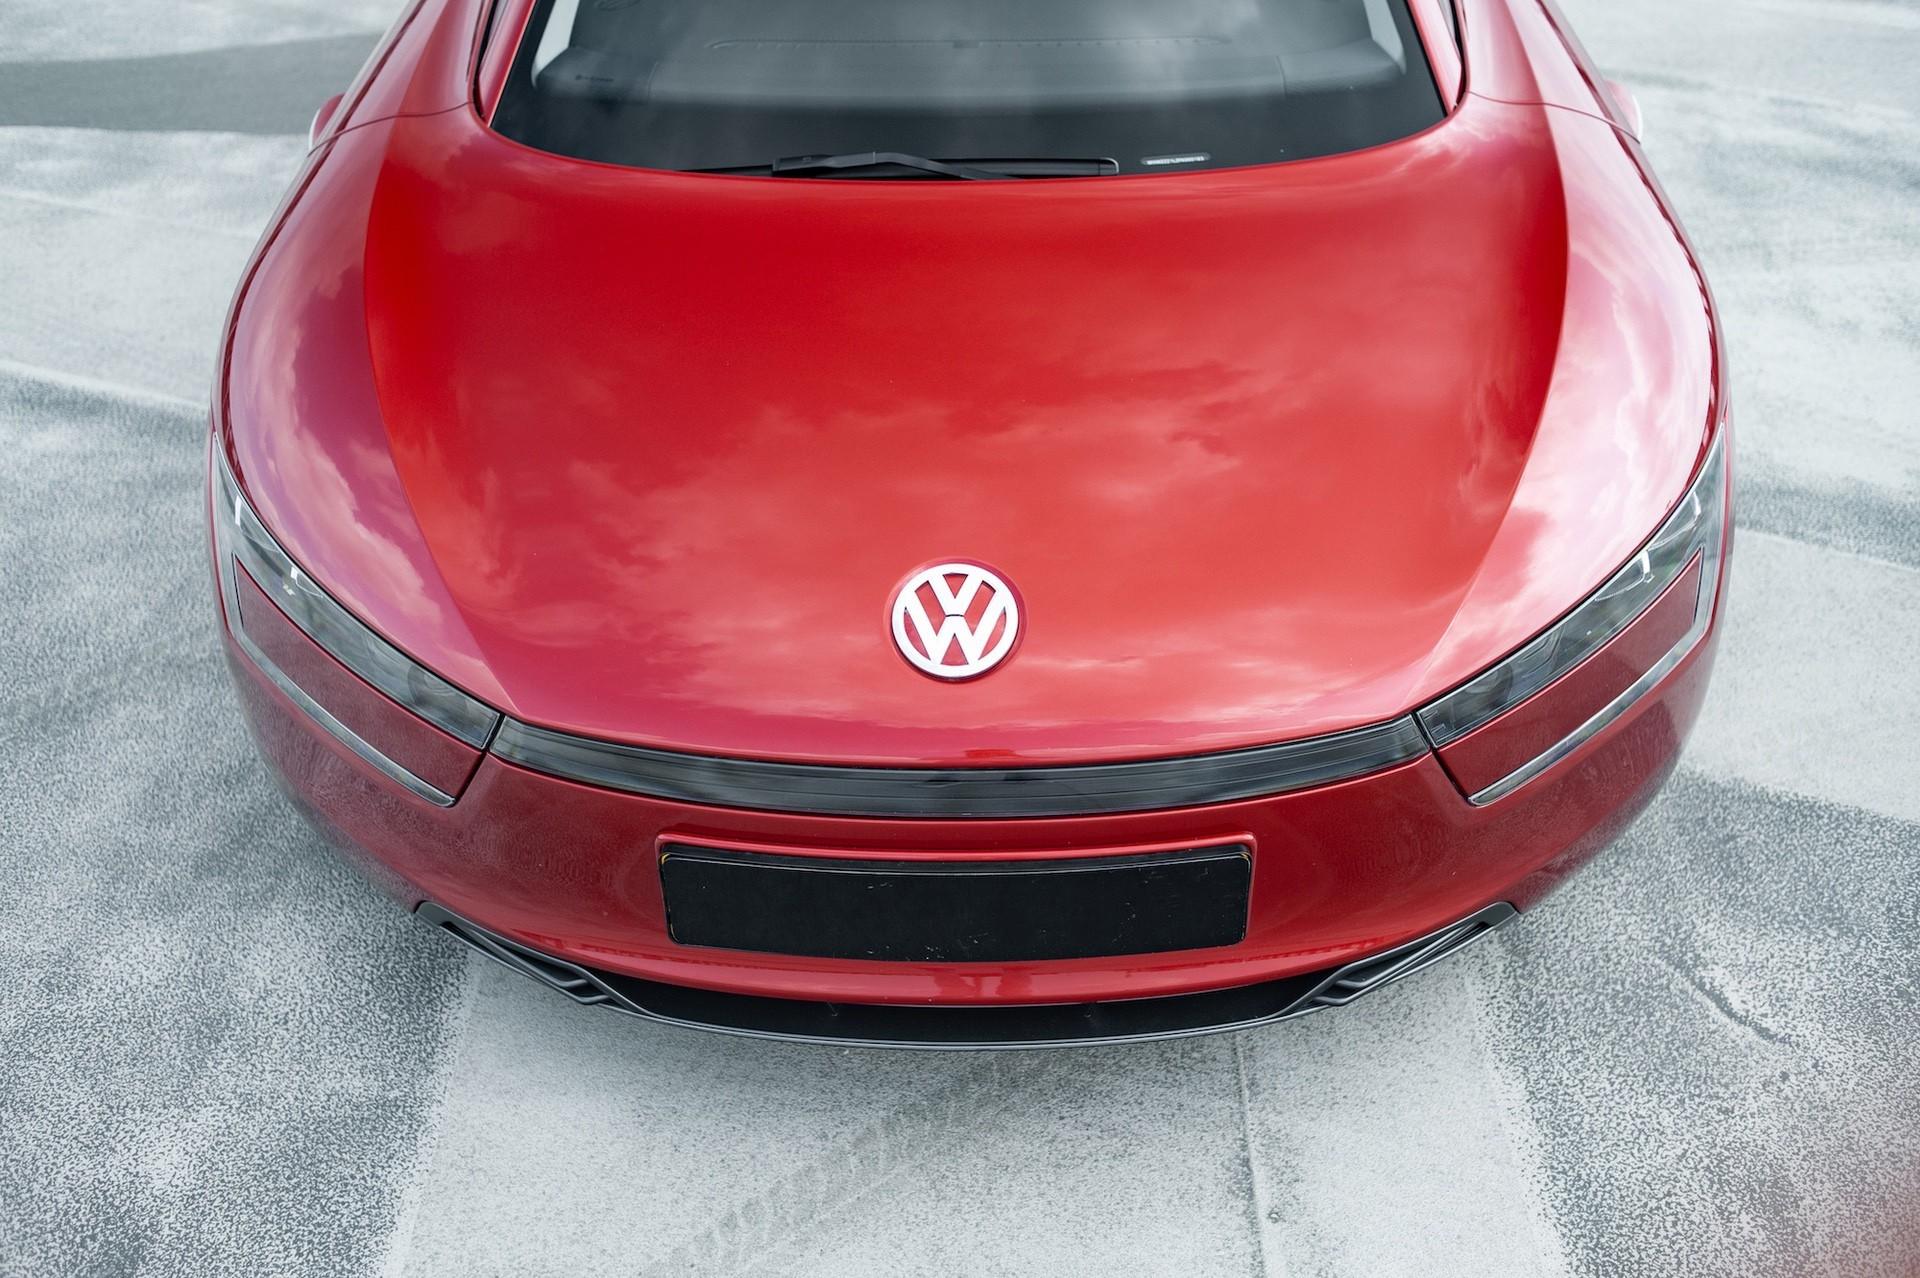 Volkswagen_XL1_sale-0064